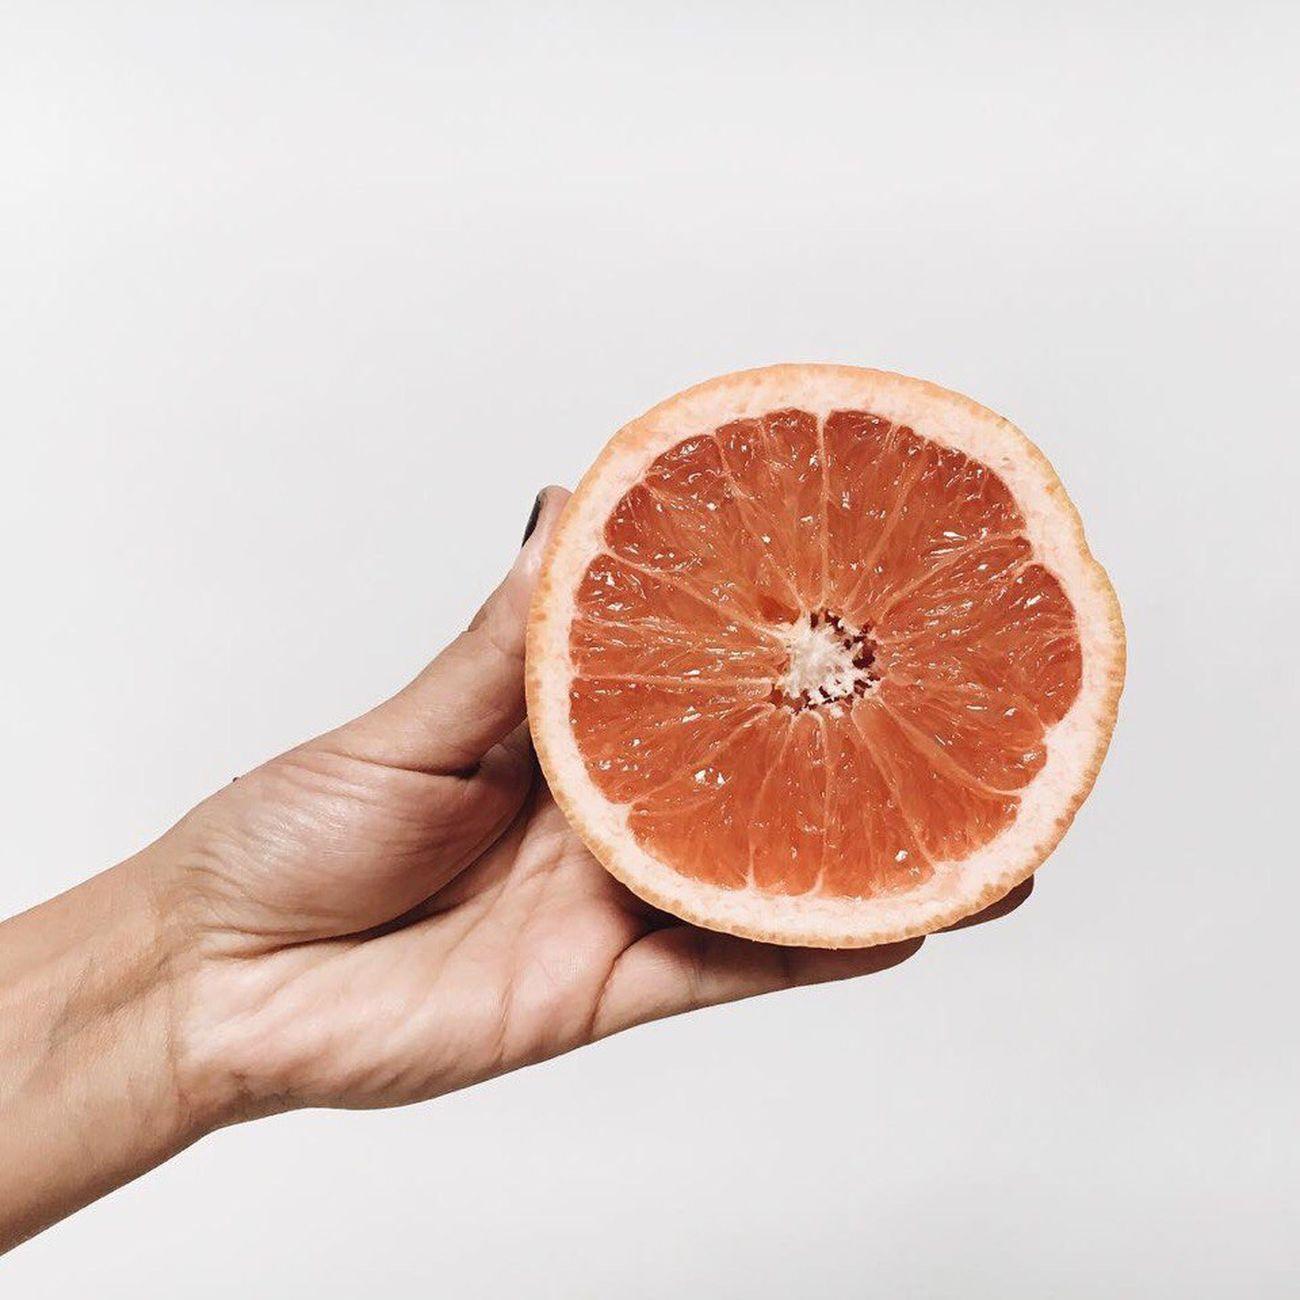 Grapefruit Food People Fruit